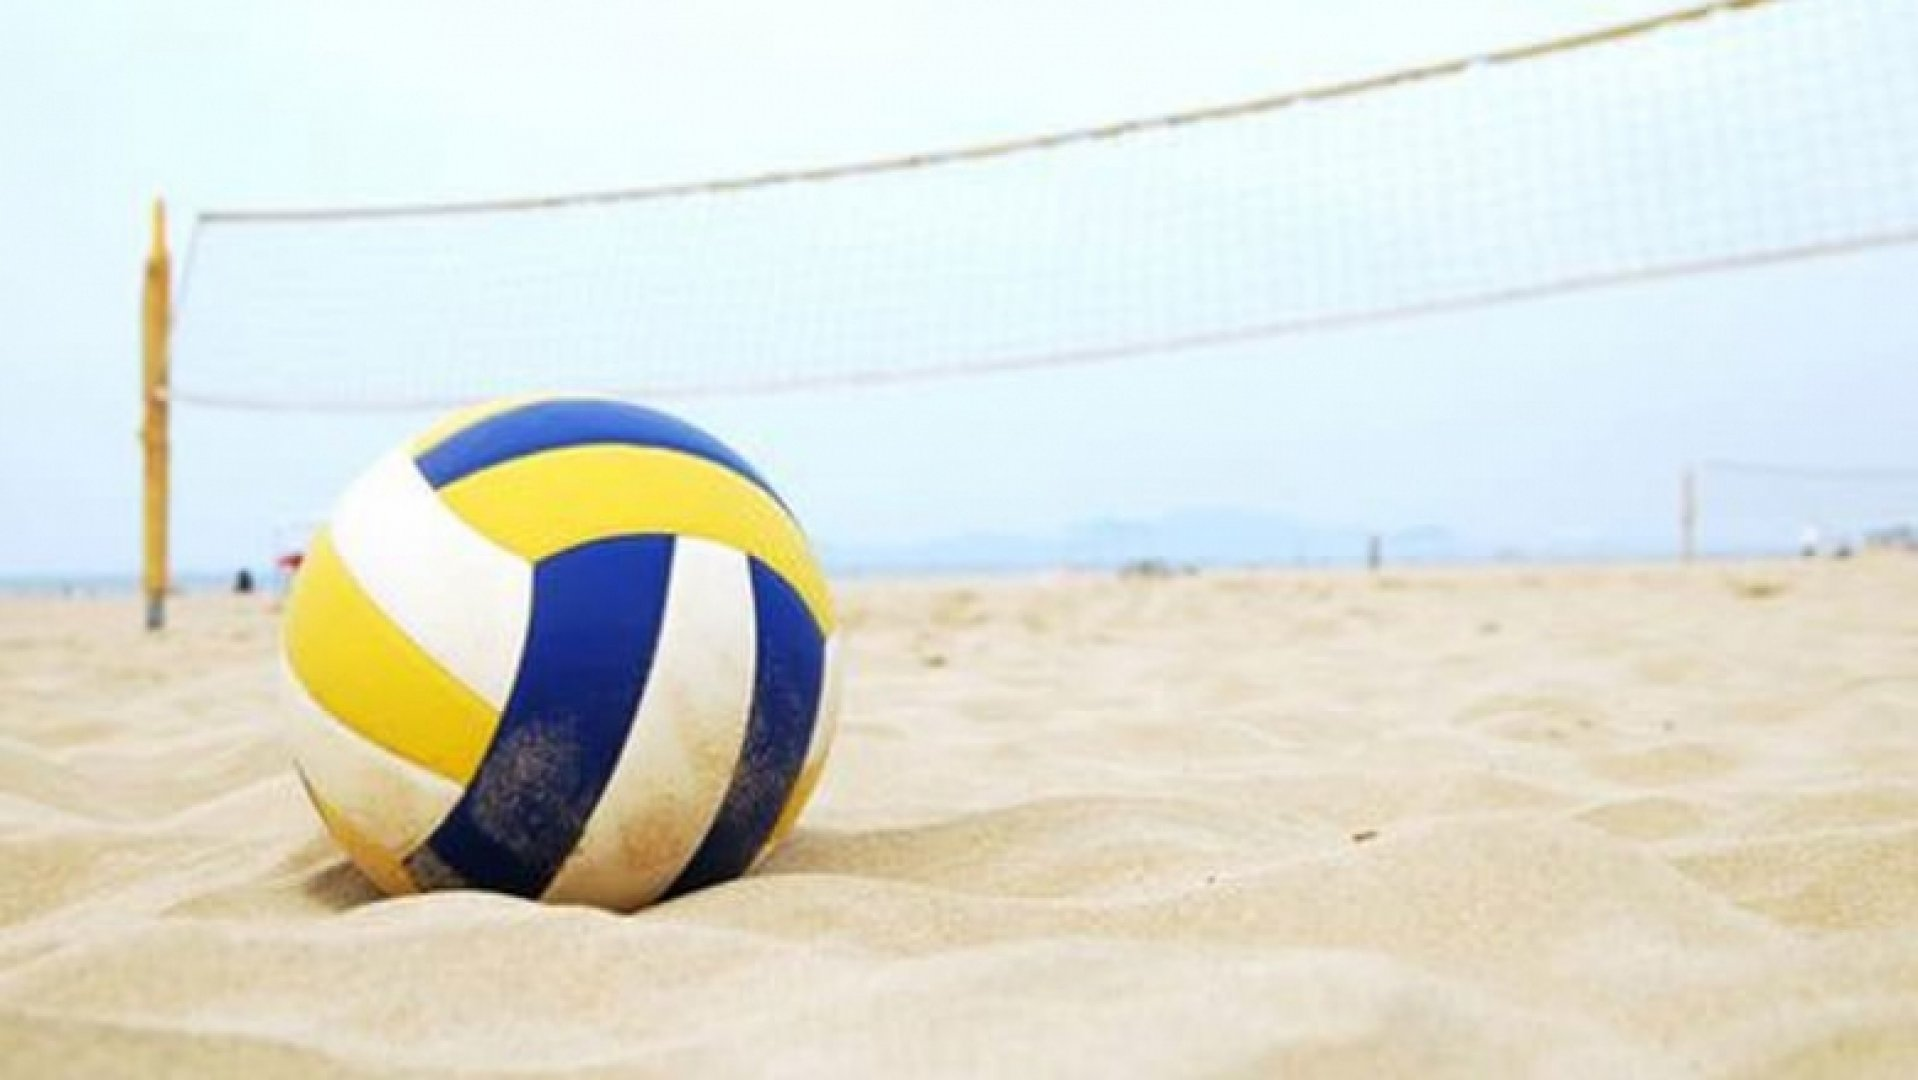 Турнирът по плажен волейбол ще се проведе на 22-ри август. Снимката е илюстративна